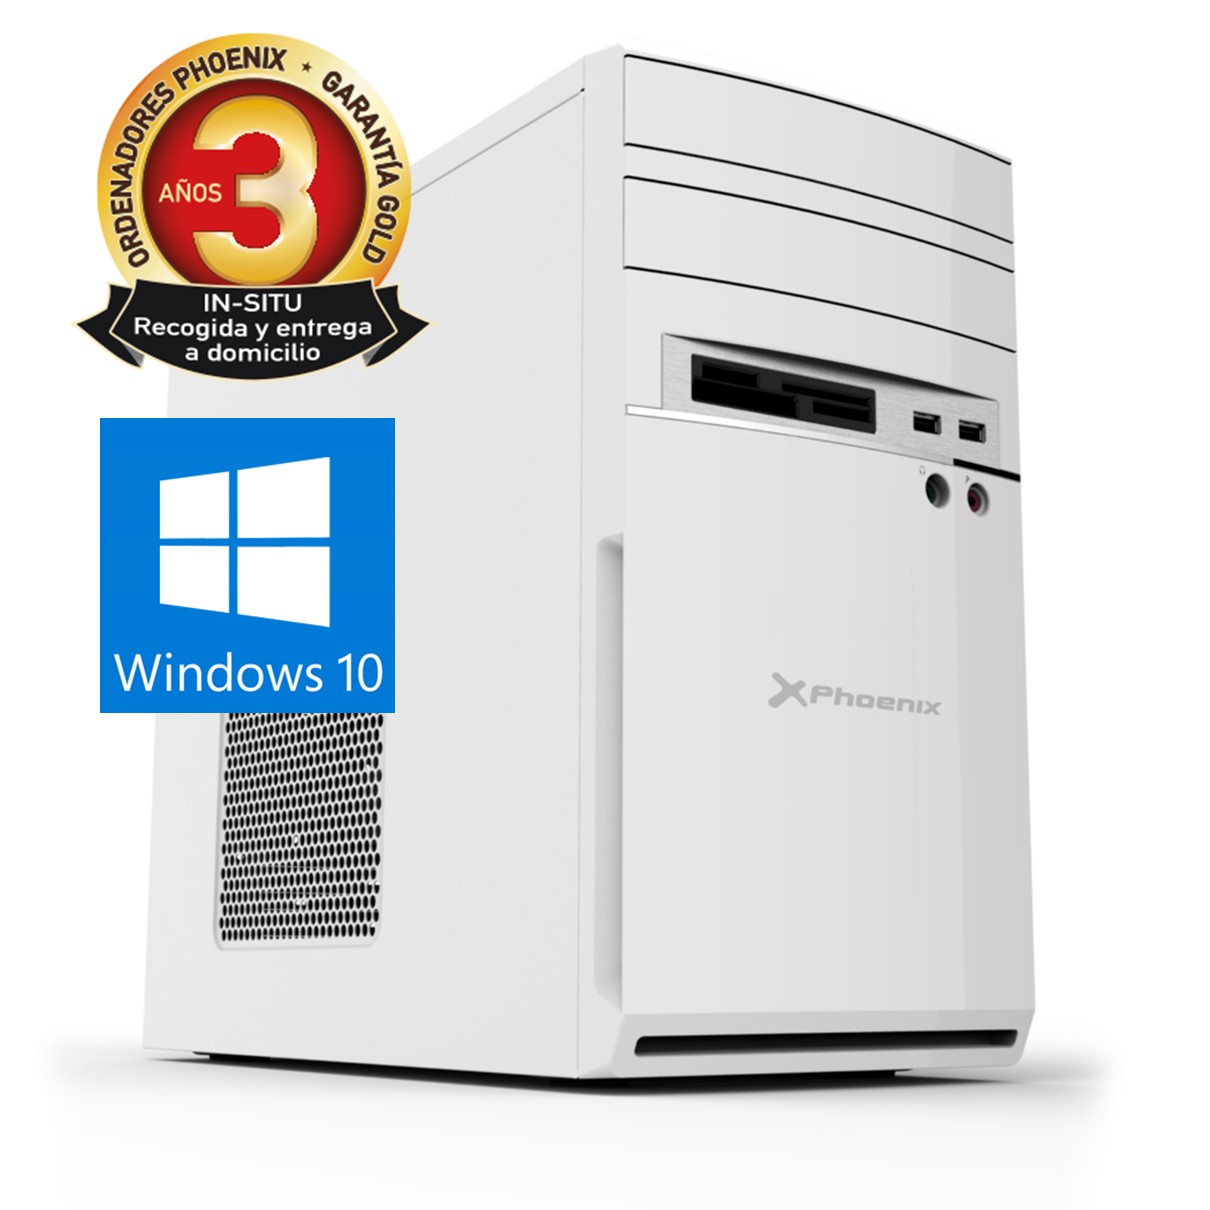 Ordenador pc phoenix moon amd ryzen 3 pro 8gb ddr4 480gb ssd rw micro atx sobremesa wifi windows 10